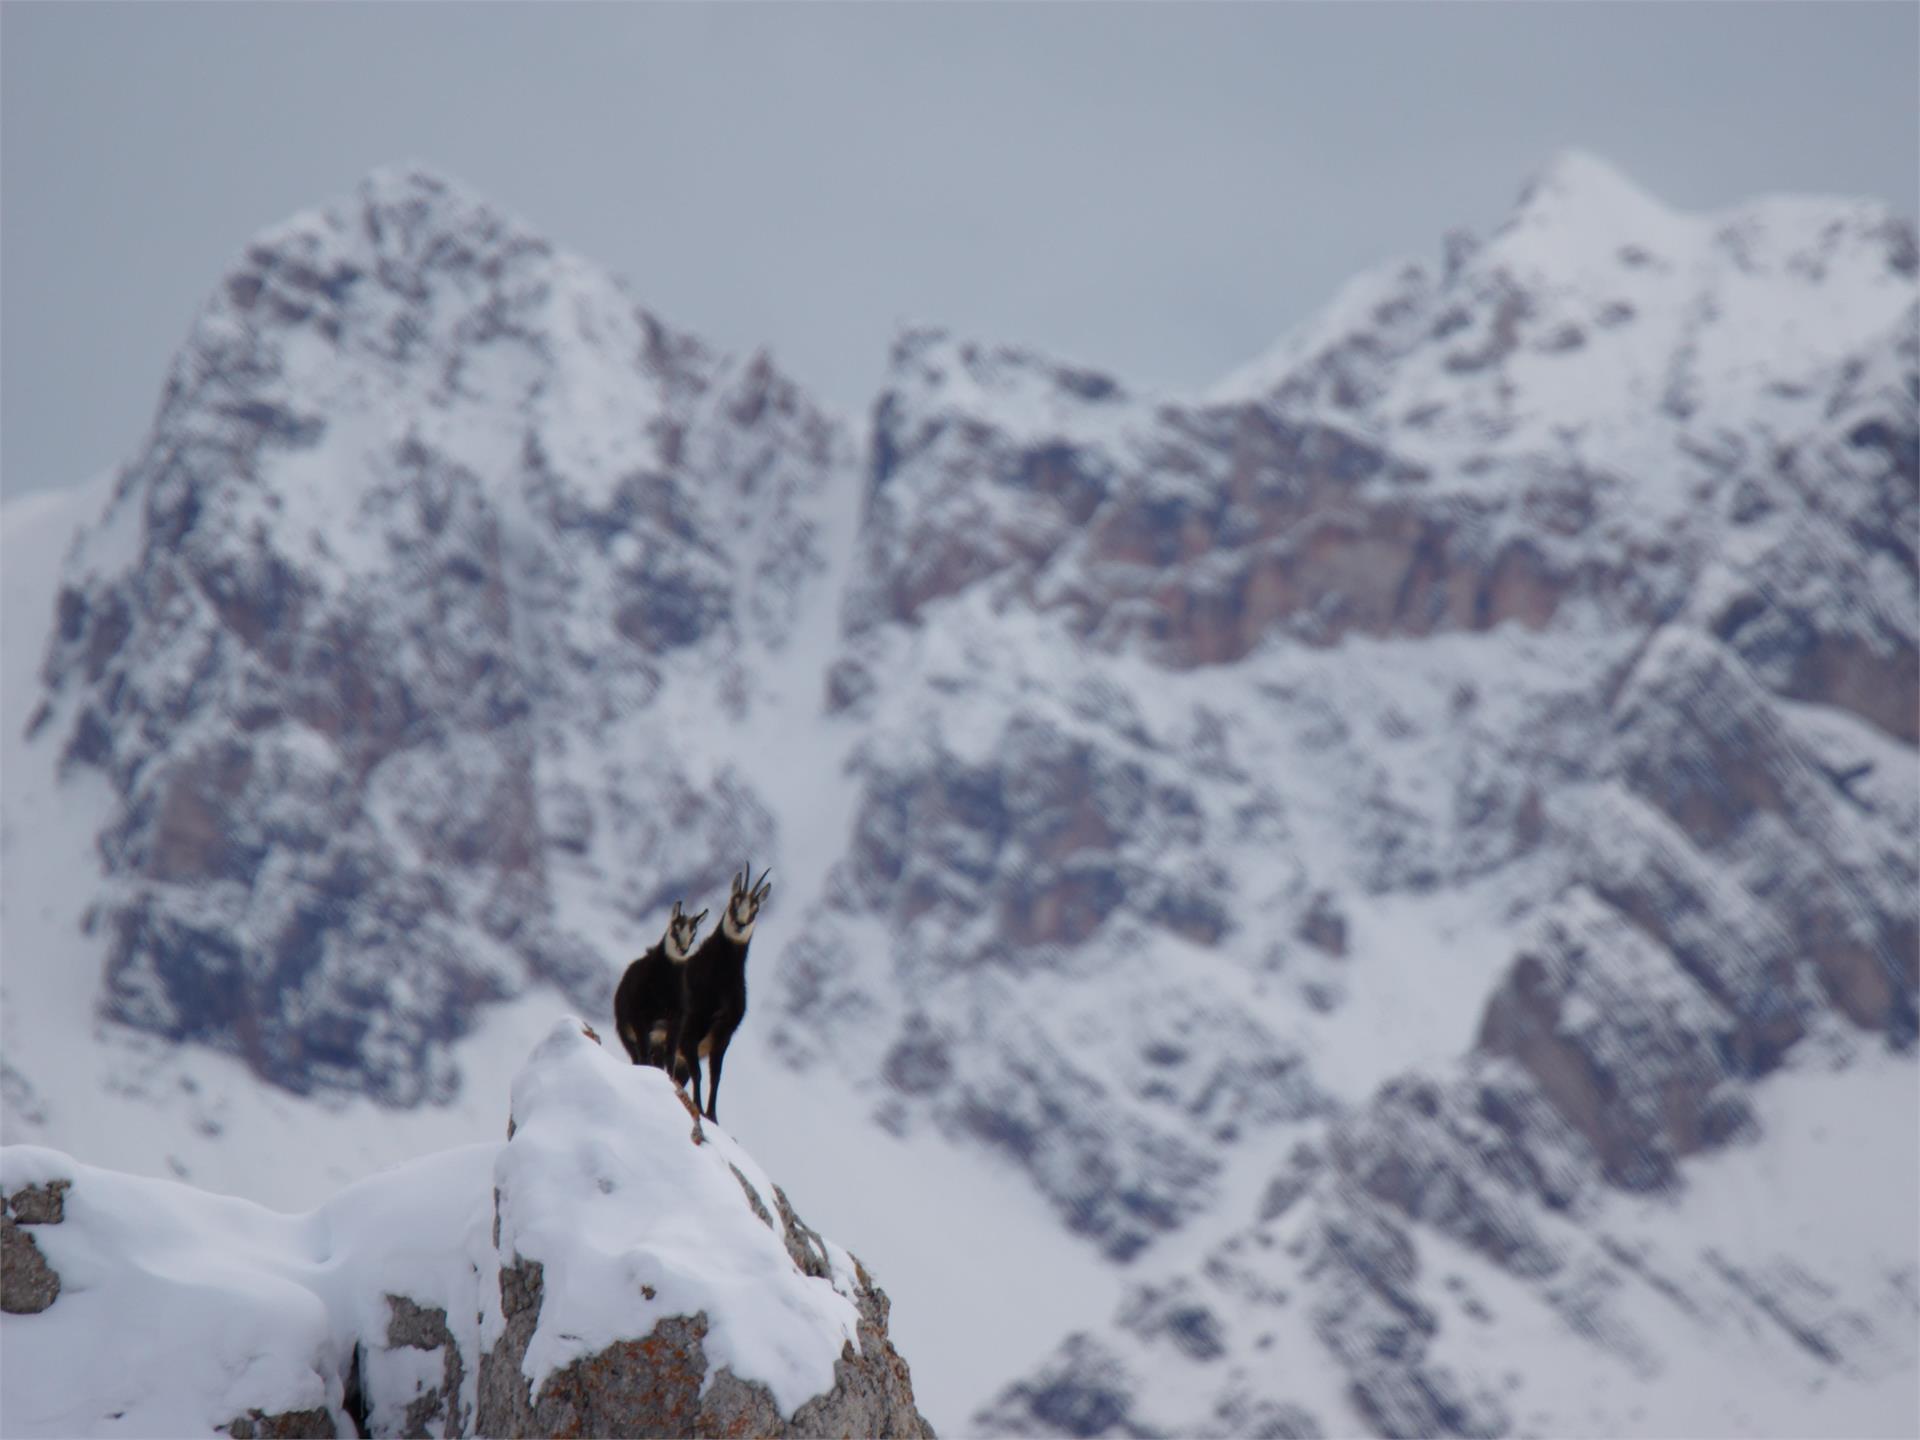 Dolomiti Ranger - Avvistamento animali selvatici